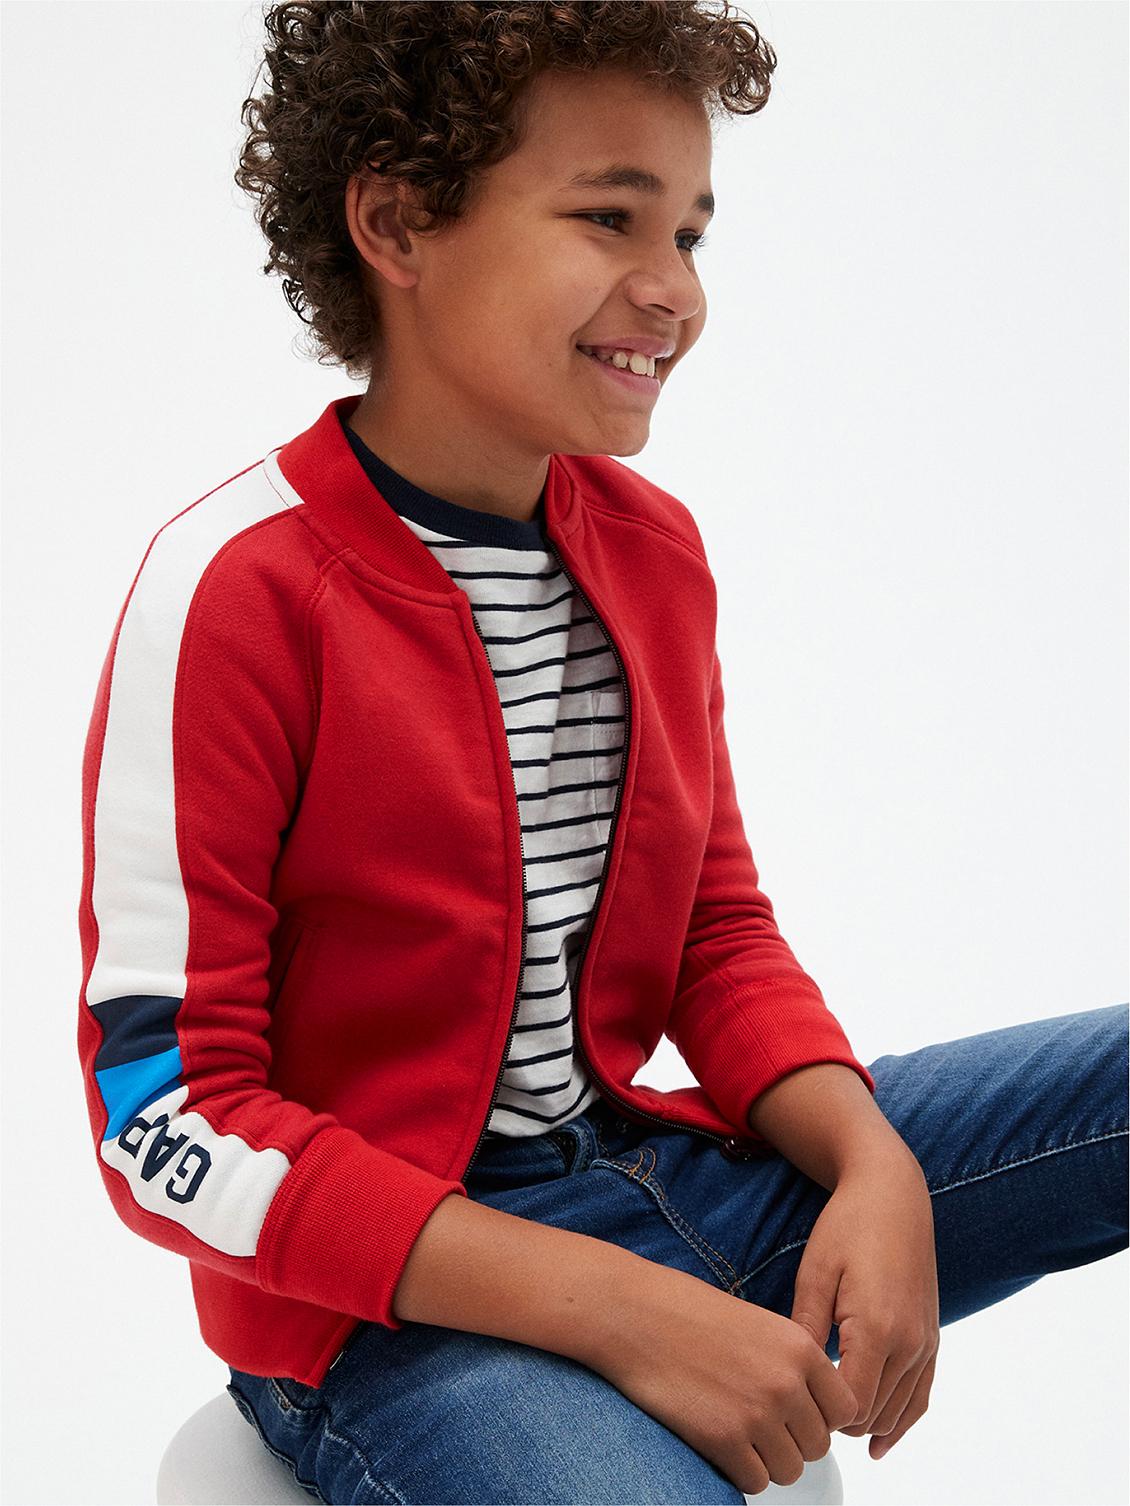 smiling boy sitting kids art director